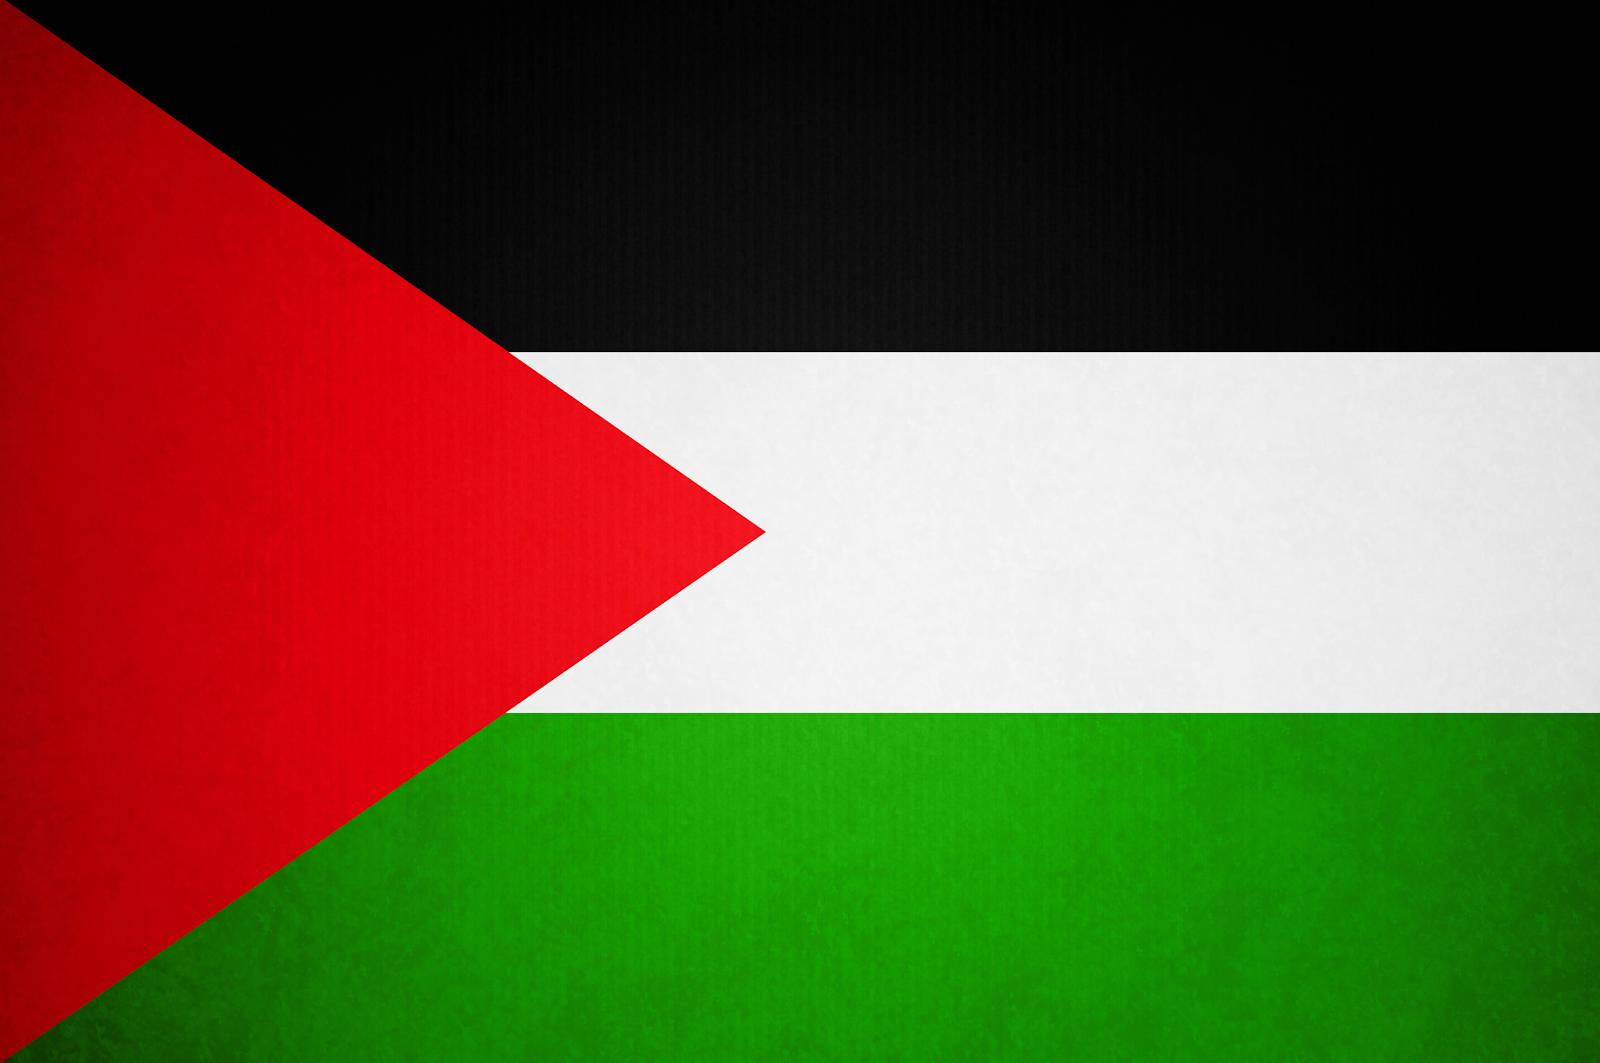 Palestine Flag Png image #38253